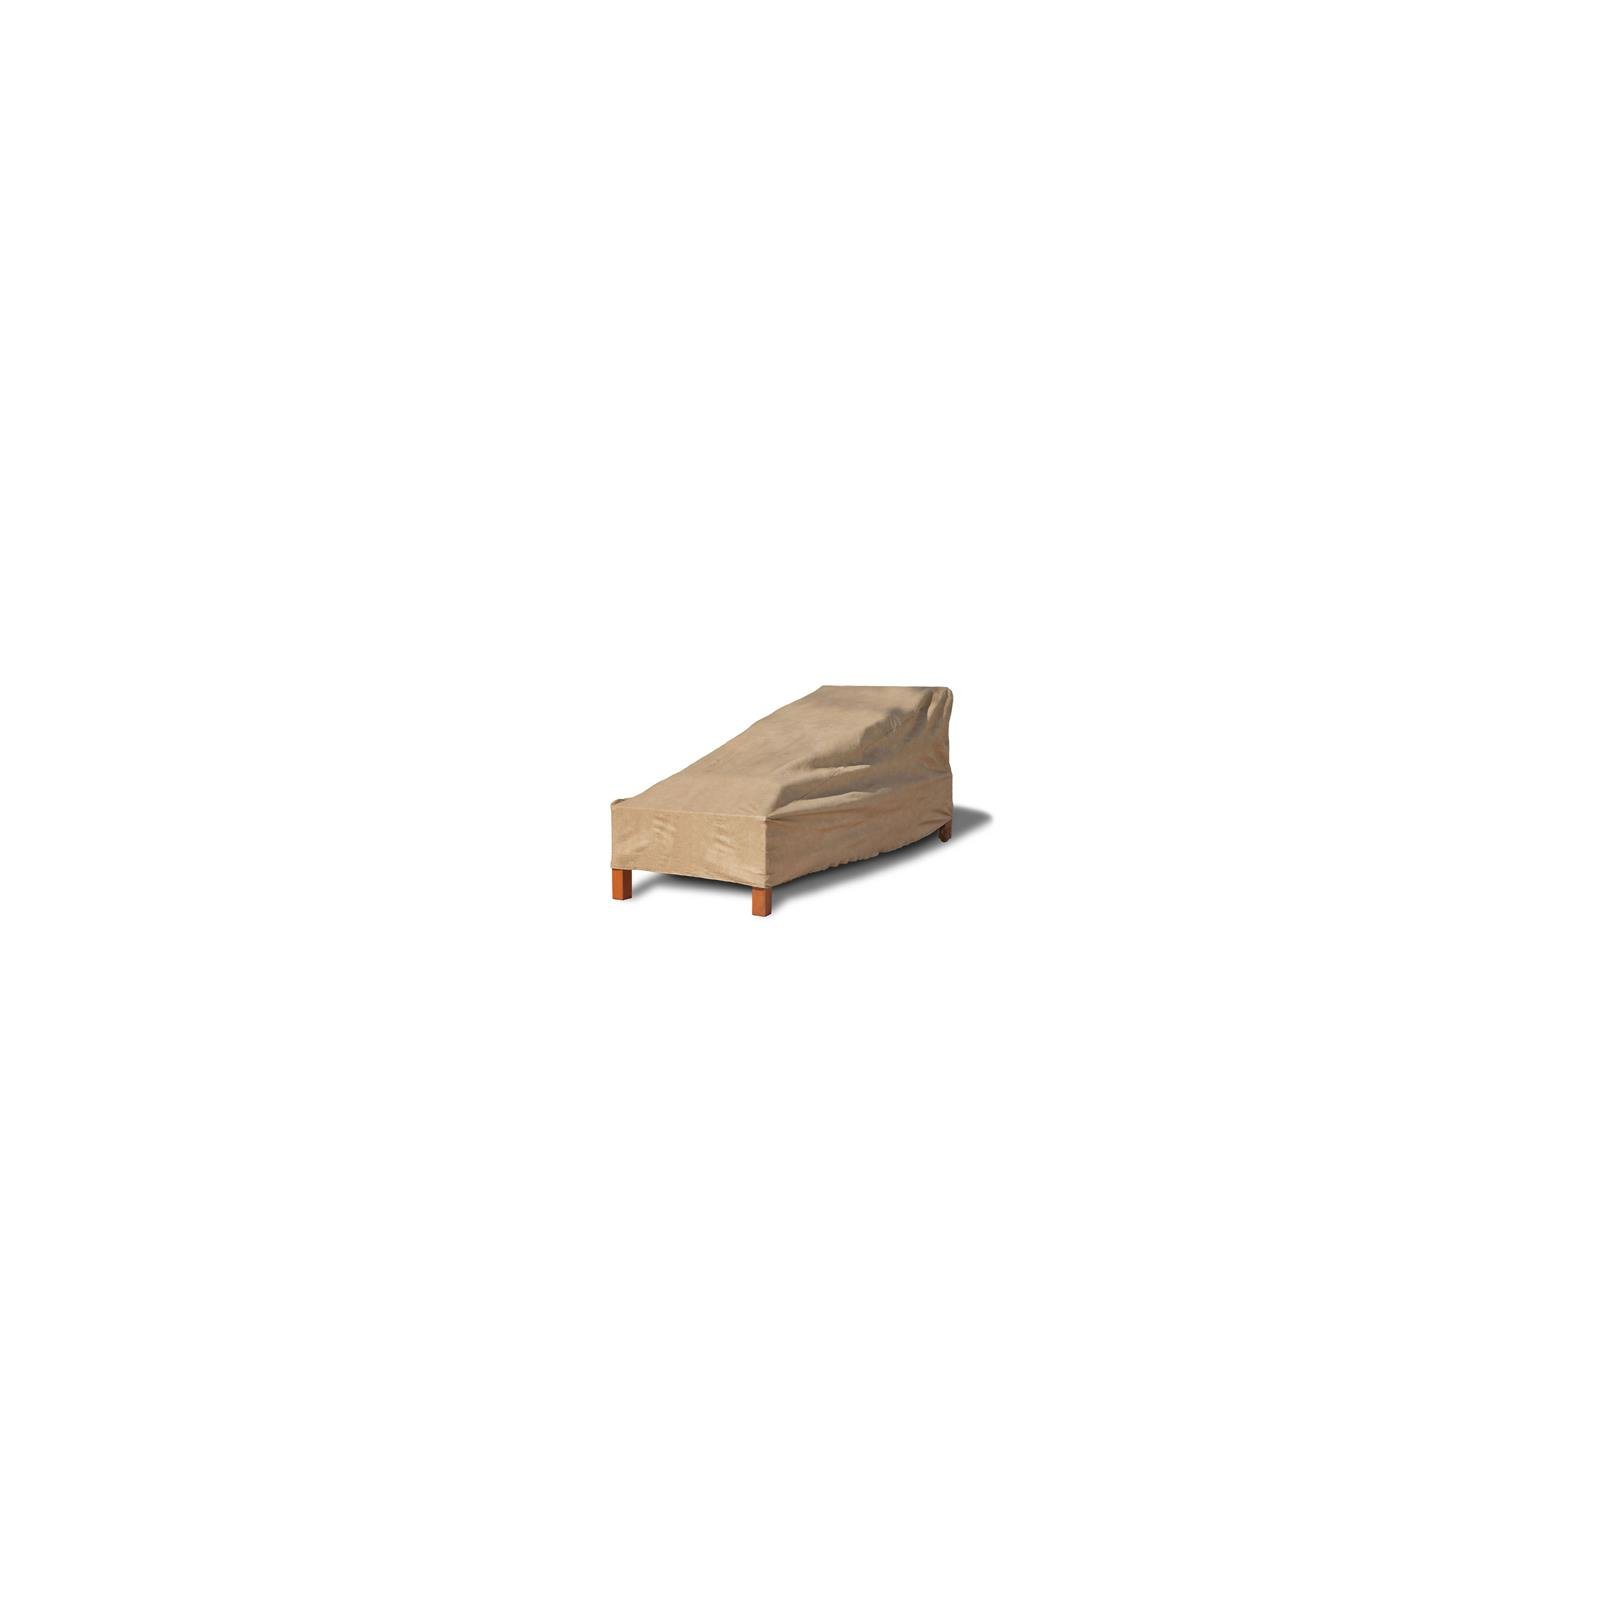 Budge Chaise Lounge Cover 80'' L X 27'' W X 30'' H Sand Polyethylene